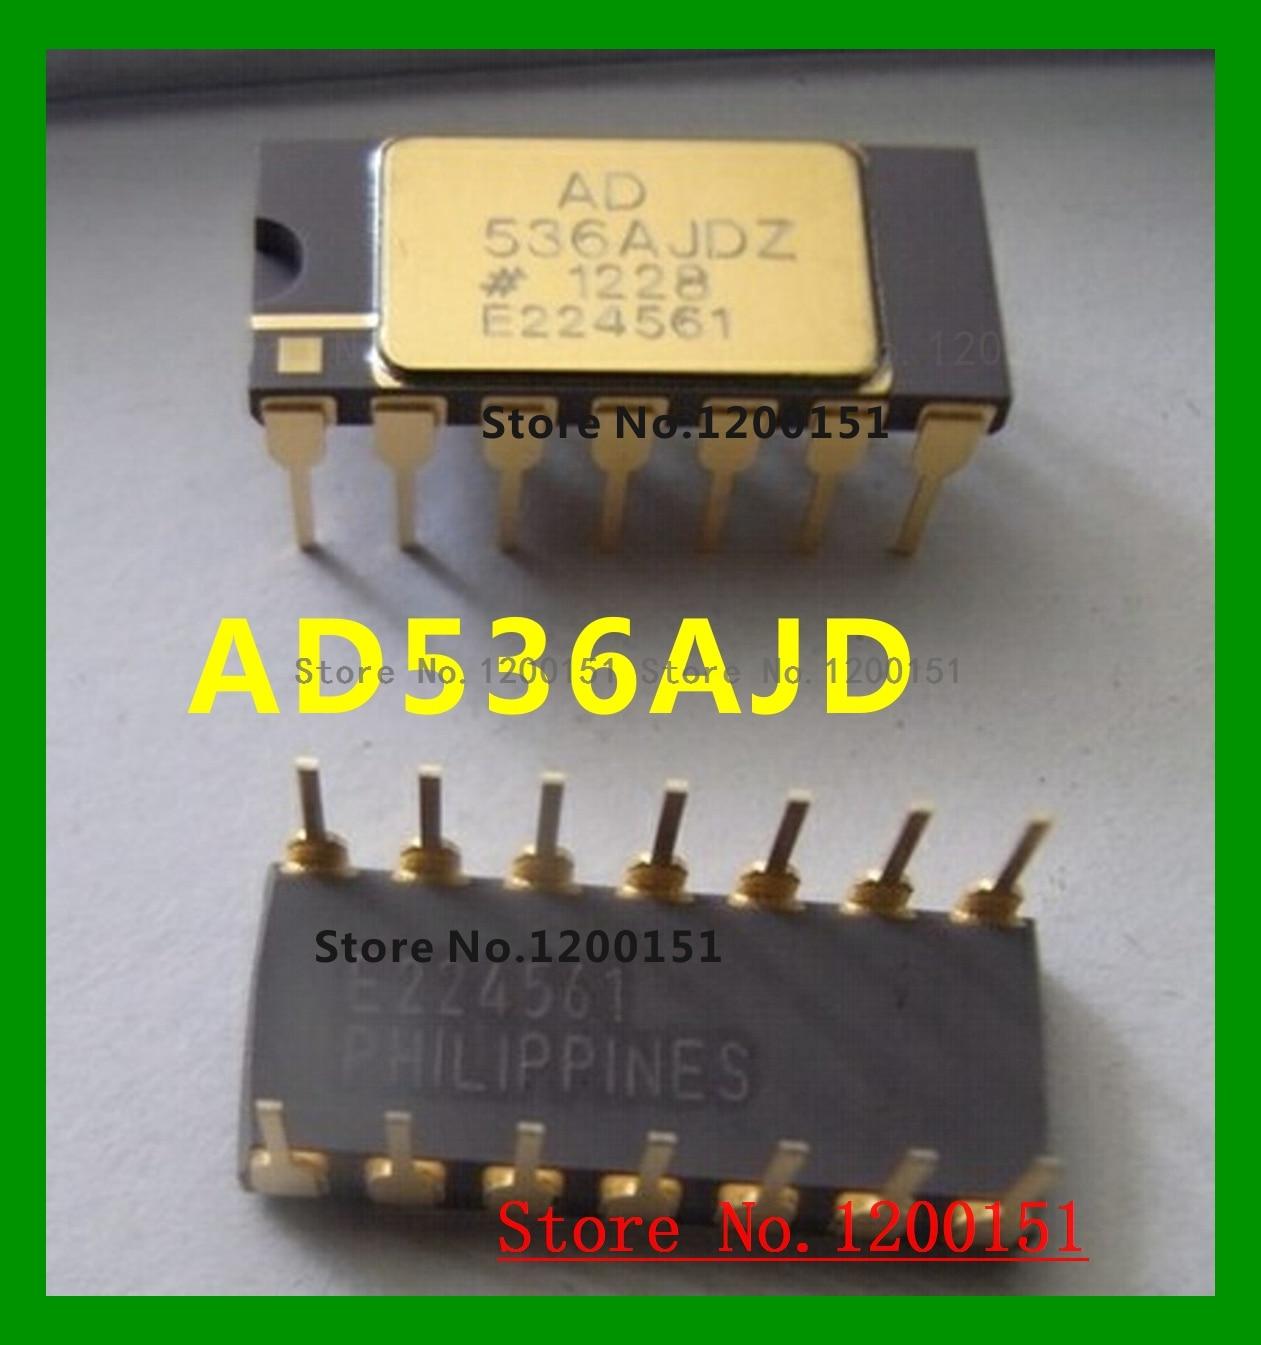 AD536AJD CDIP-14 AD536AJH PODE